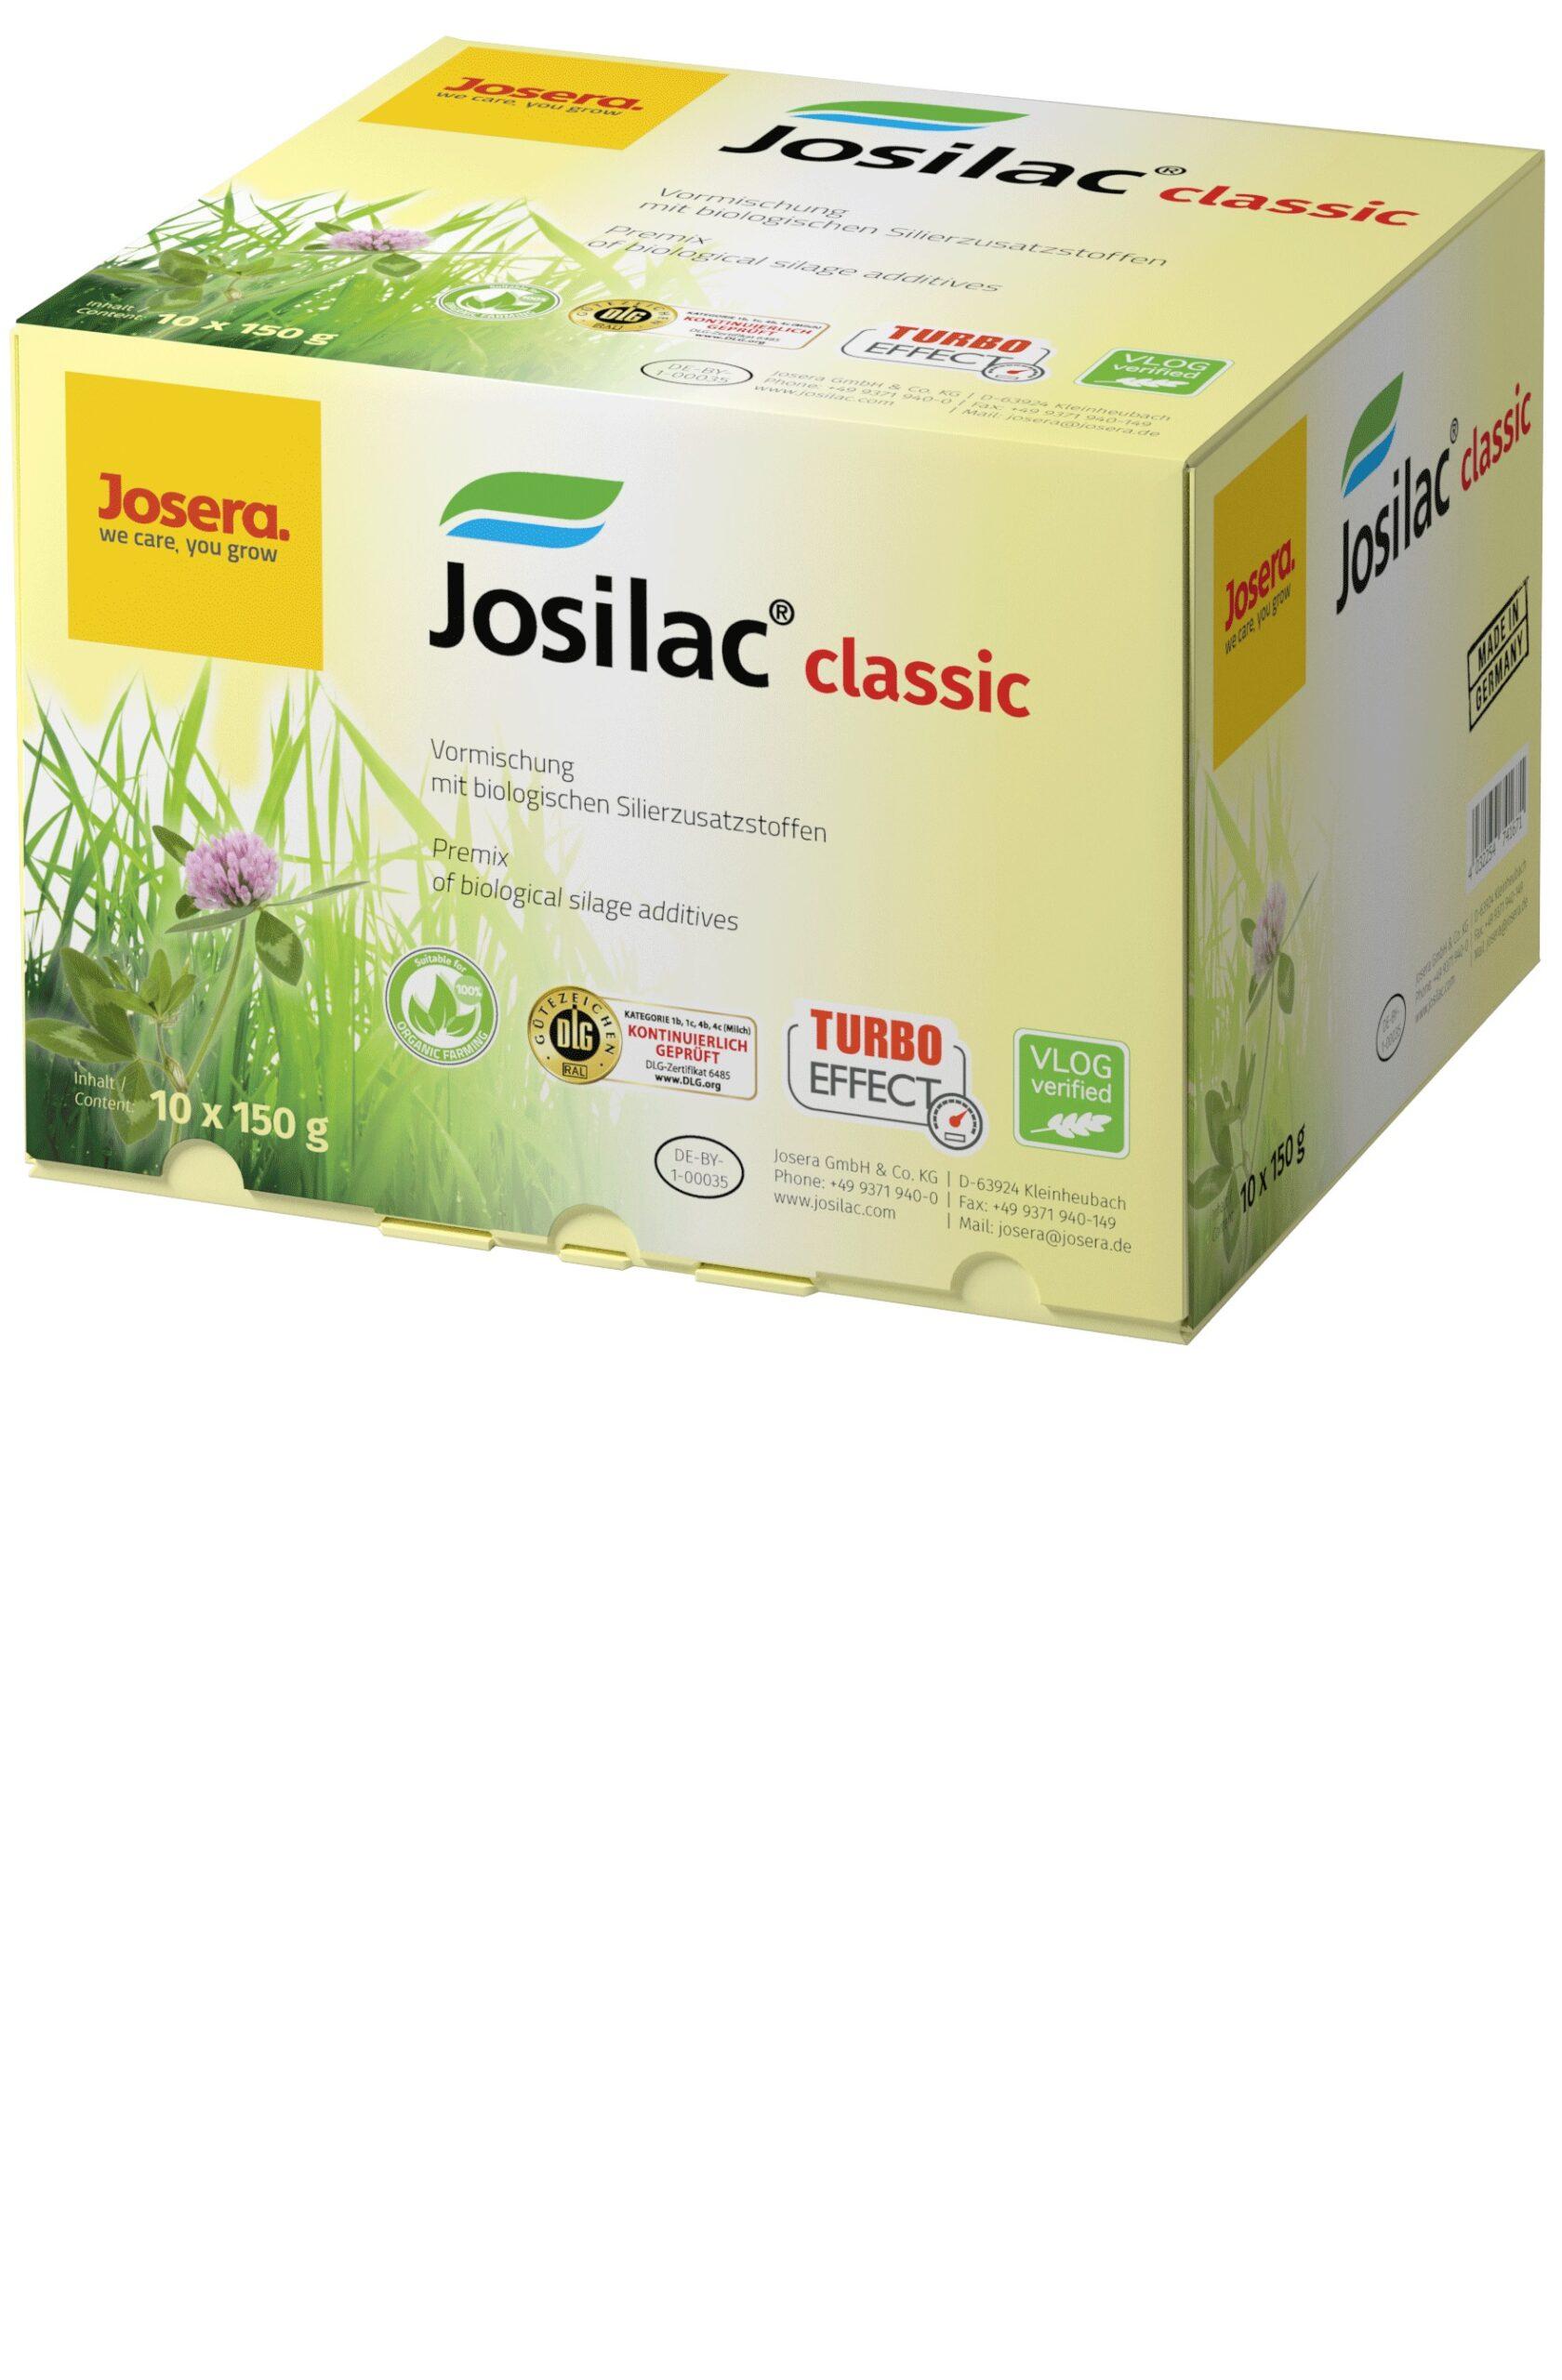 Josilac classic, Josera